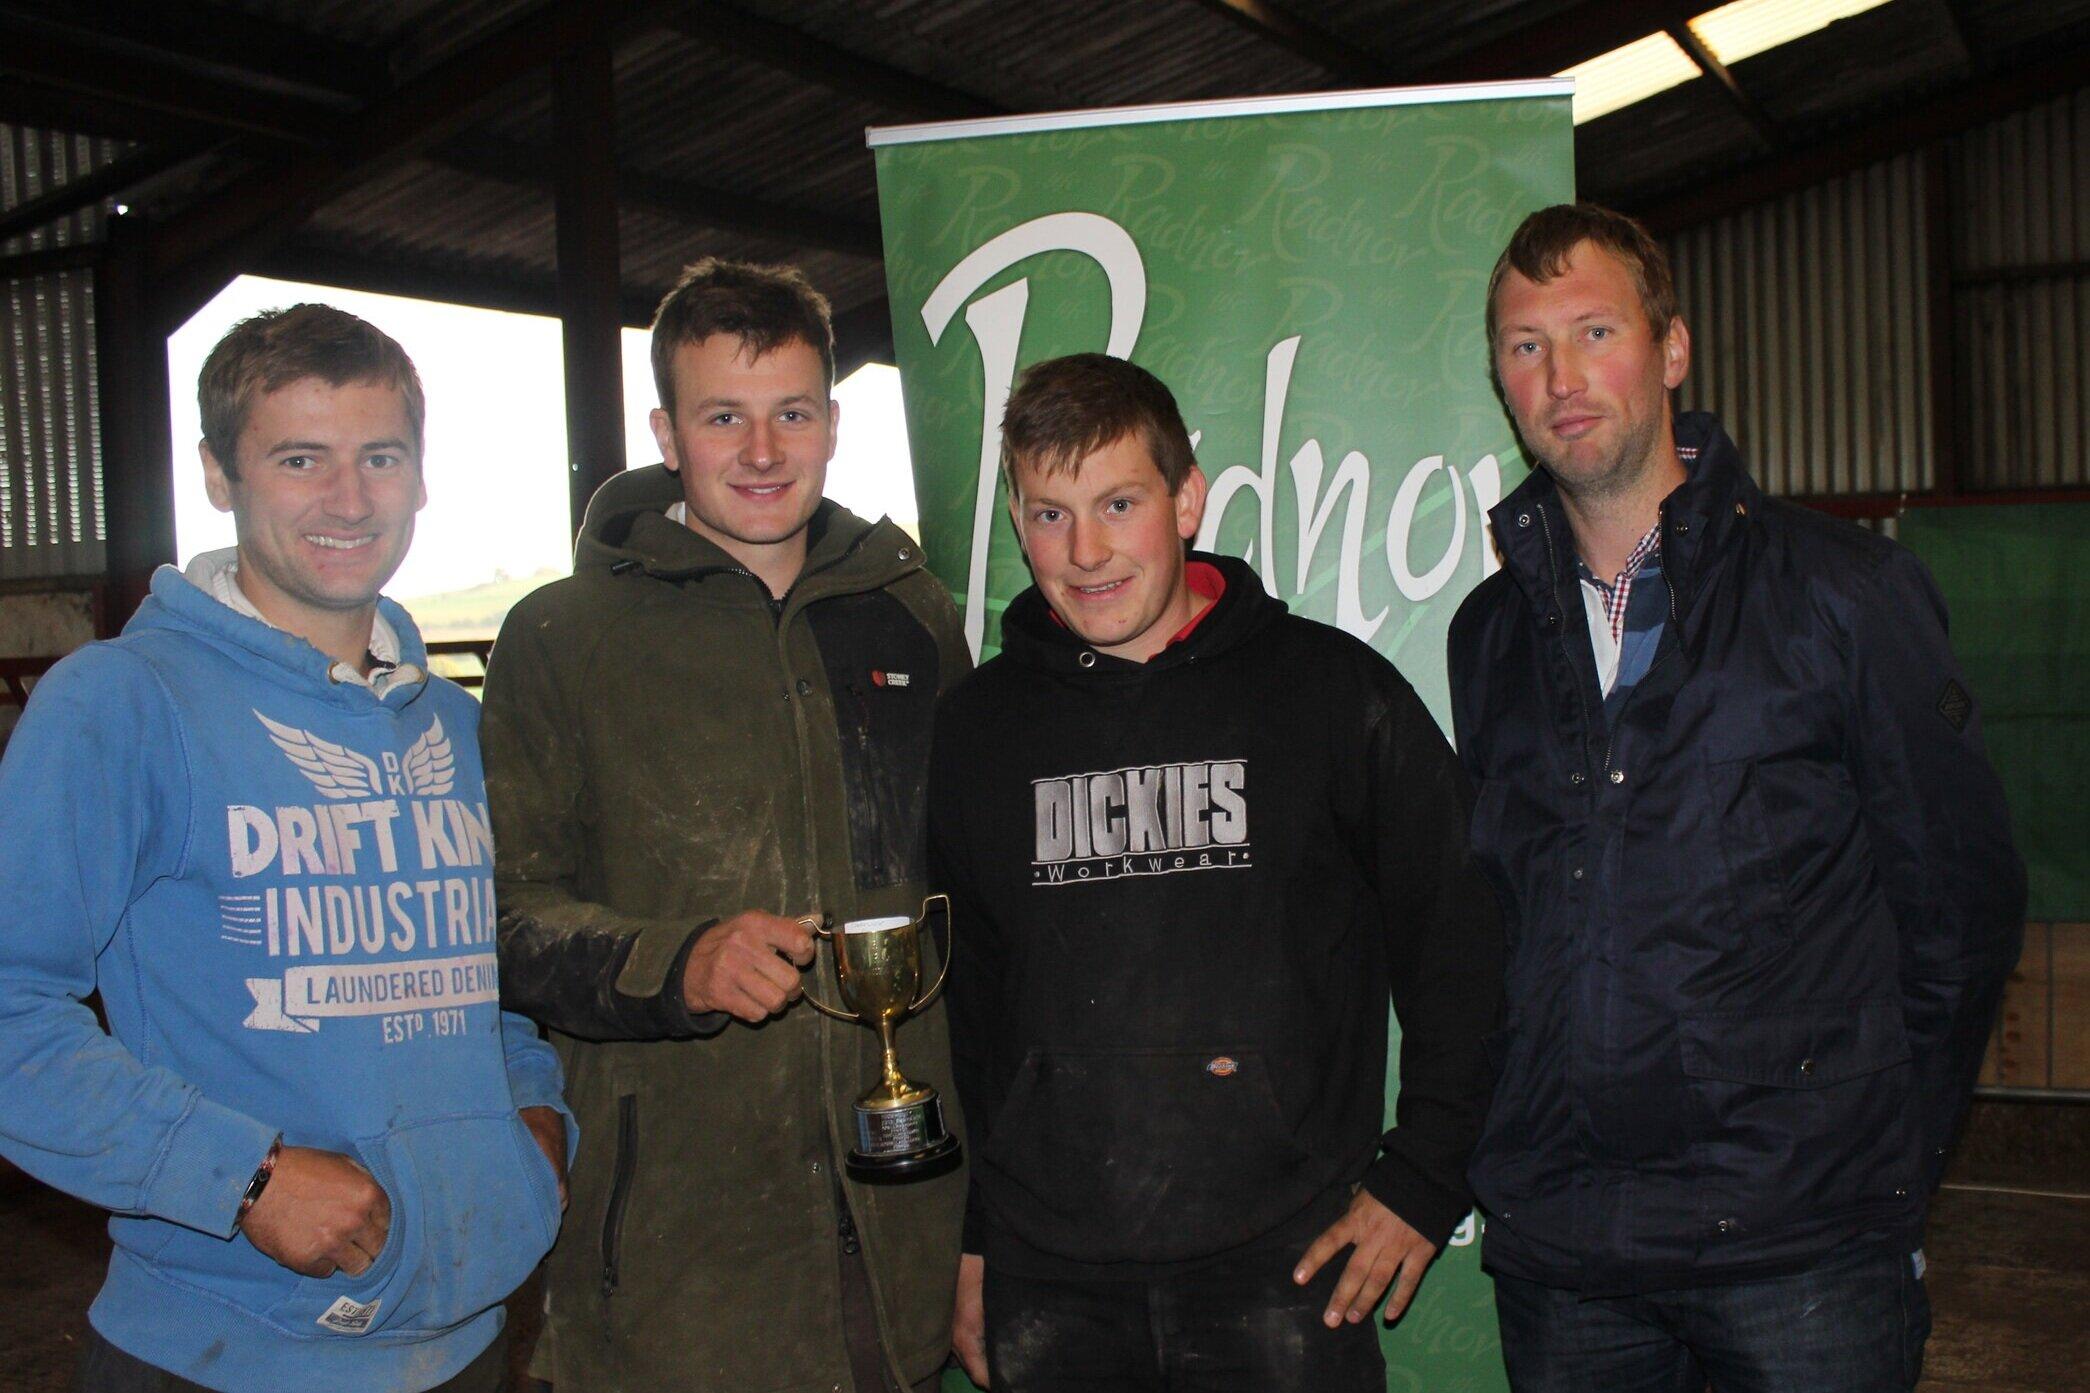 Gwilym Lewis, Bryn Lewis & Oliver Jones, Llanbadarn Fynydd YFC - Llanbadarn Fynydd YFC Challenge Cup for the Senior Fencing with Sponsor, Dan Davies, Gamic Trailers